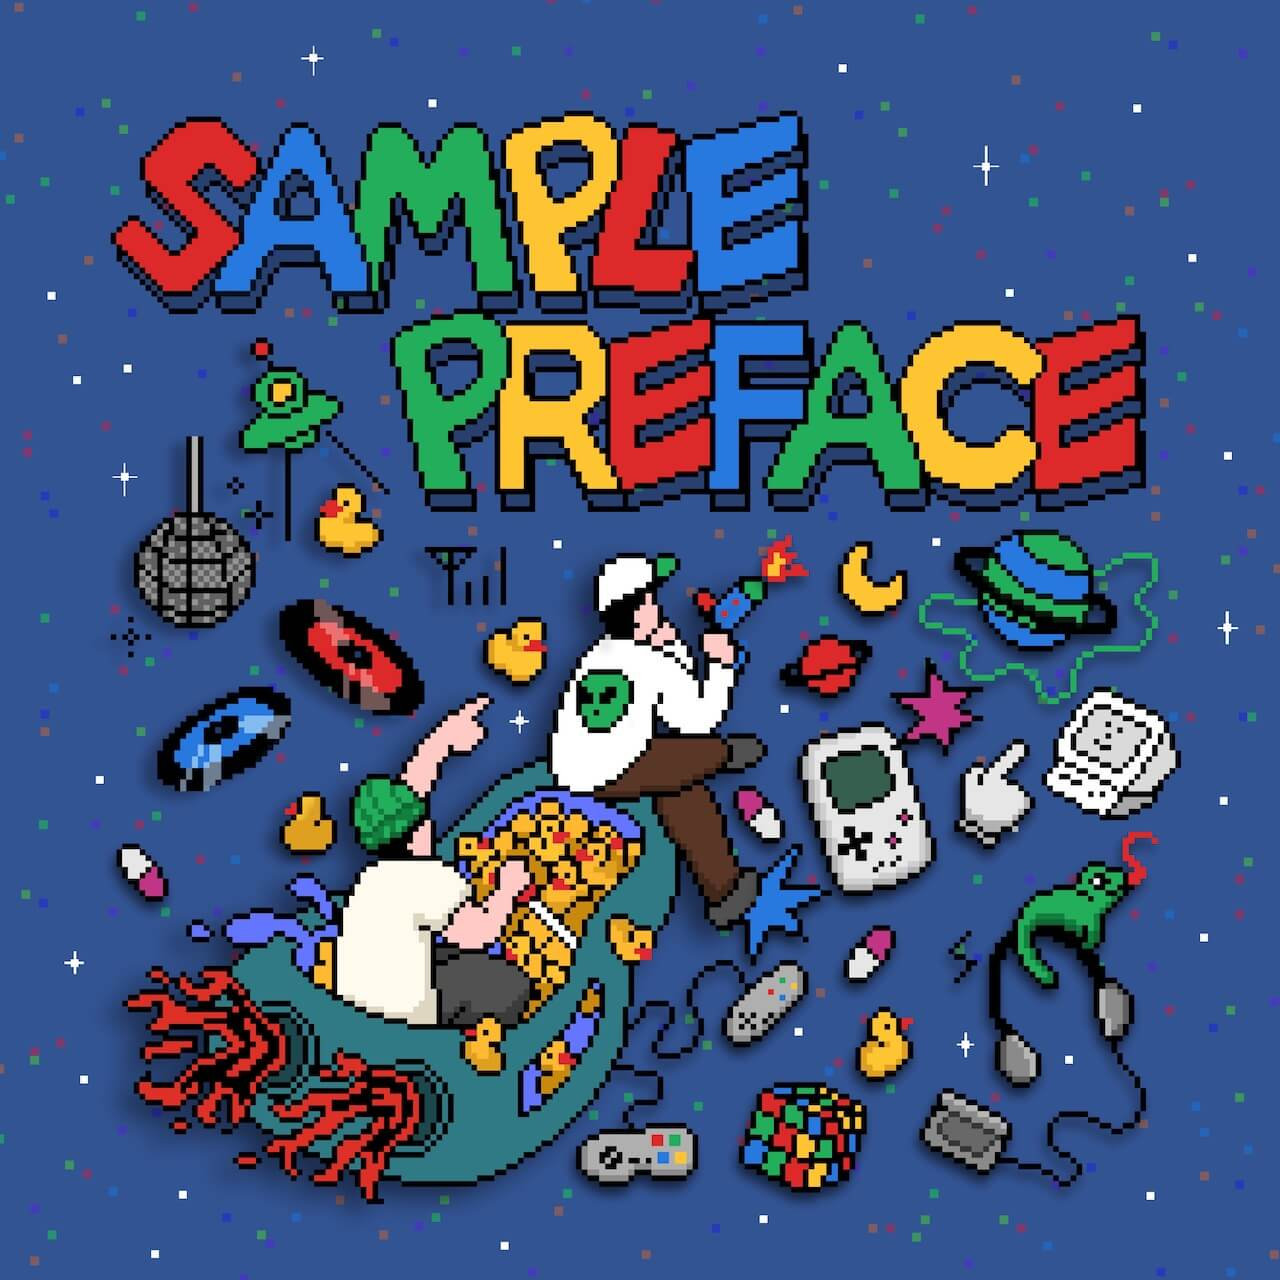 ratiffとhyunis1000のヒップホップ・クルーNeibissがフルアルバム『Sample Preface』がリリース music210917-neibiss-sample-preface-2